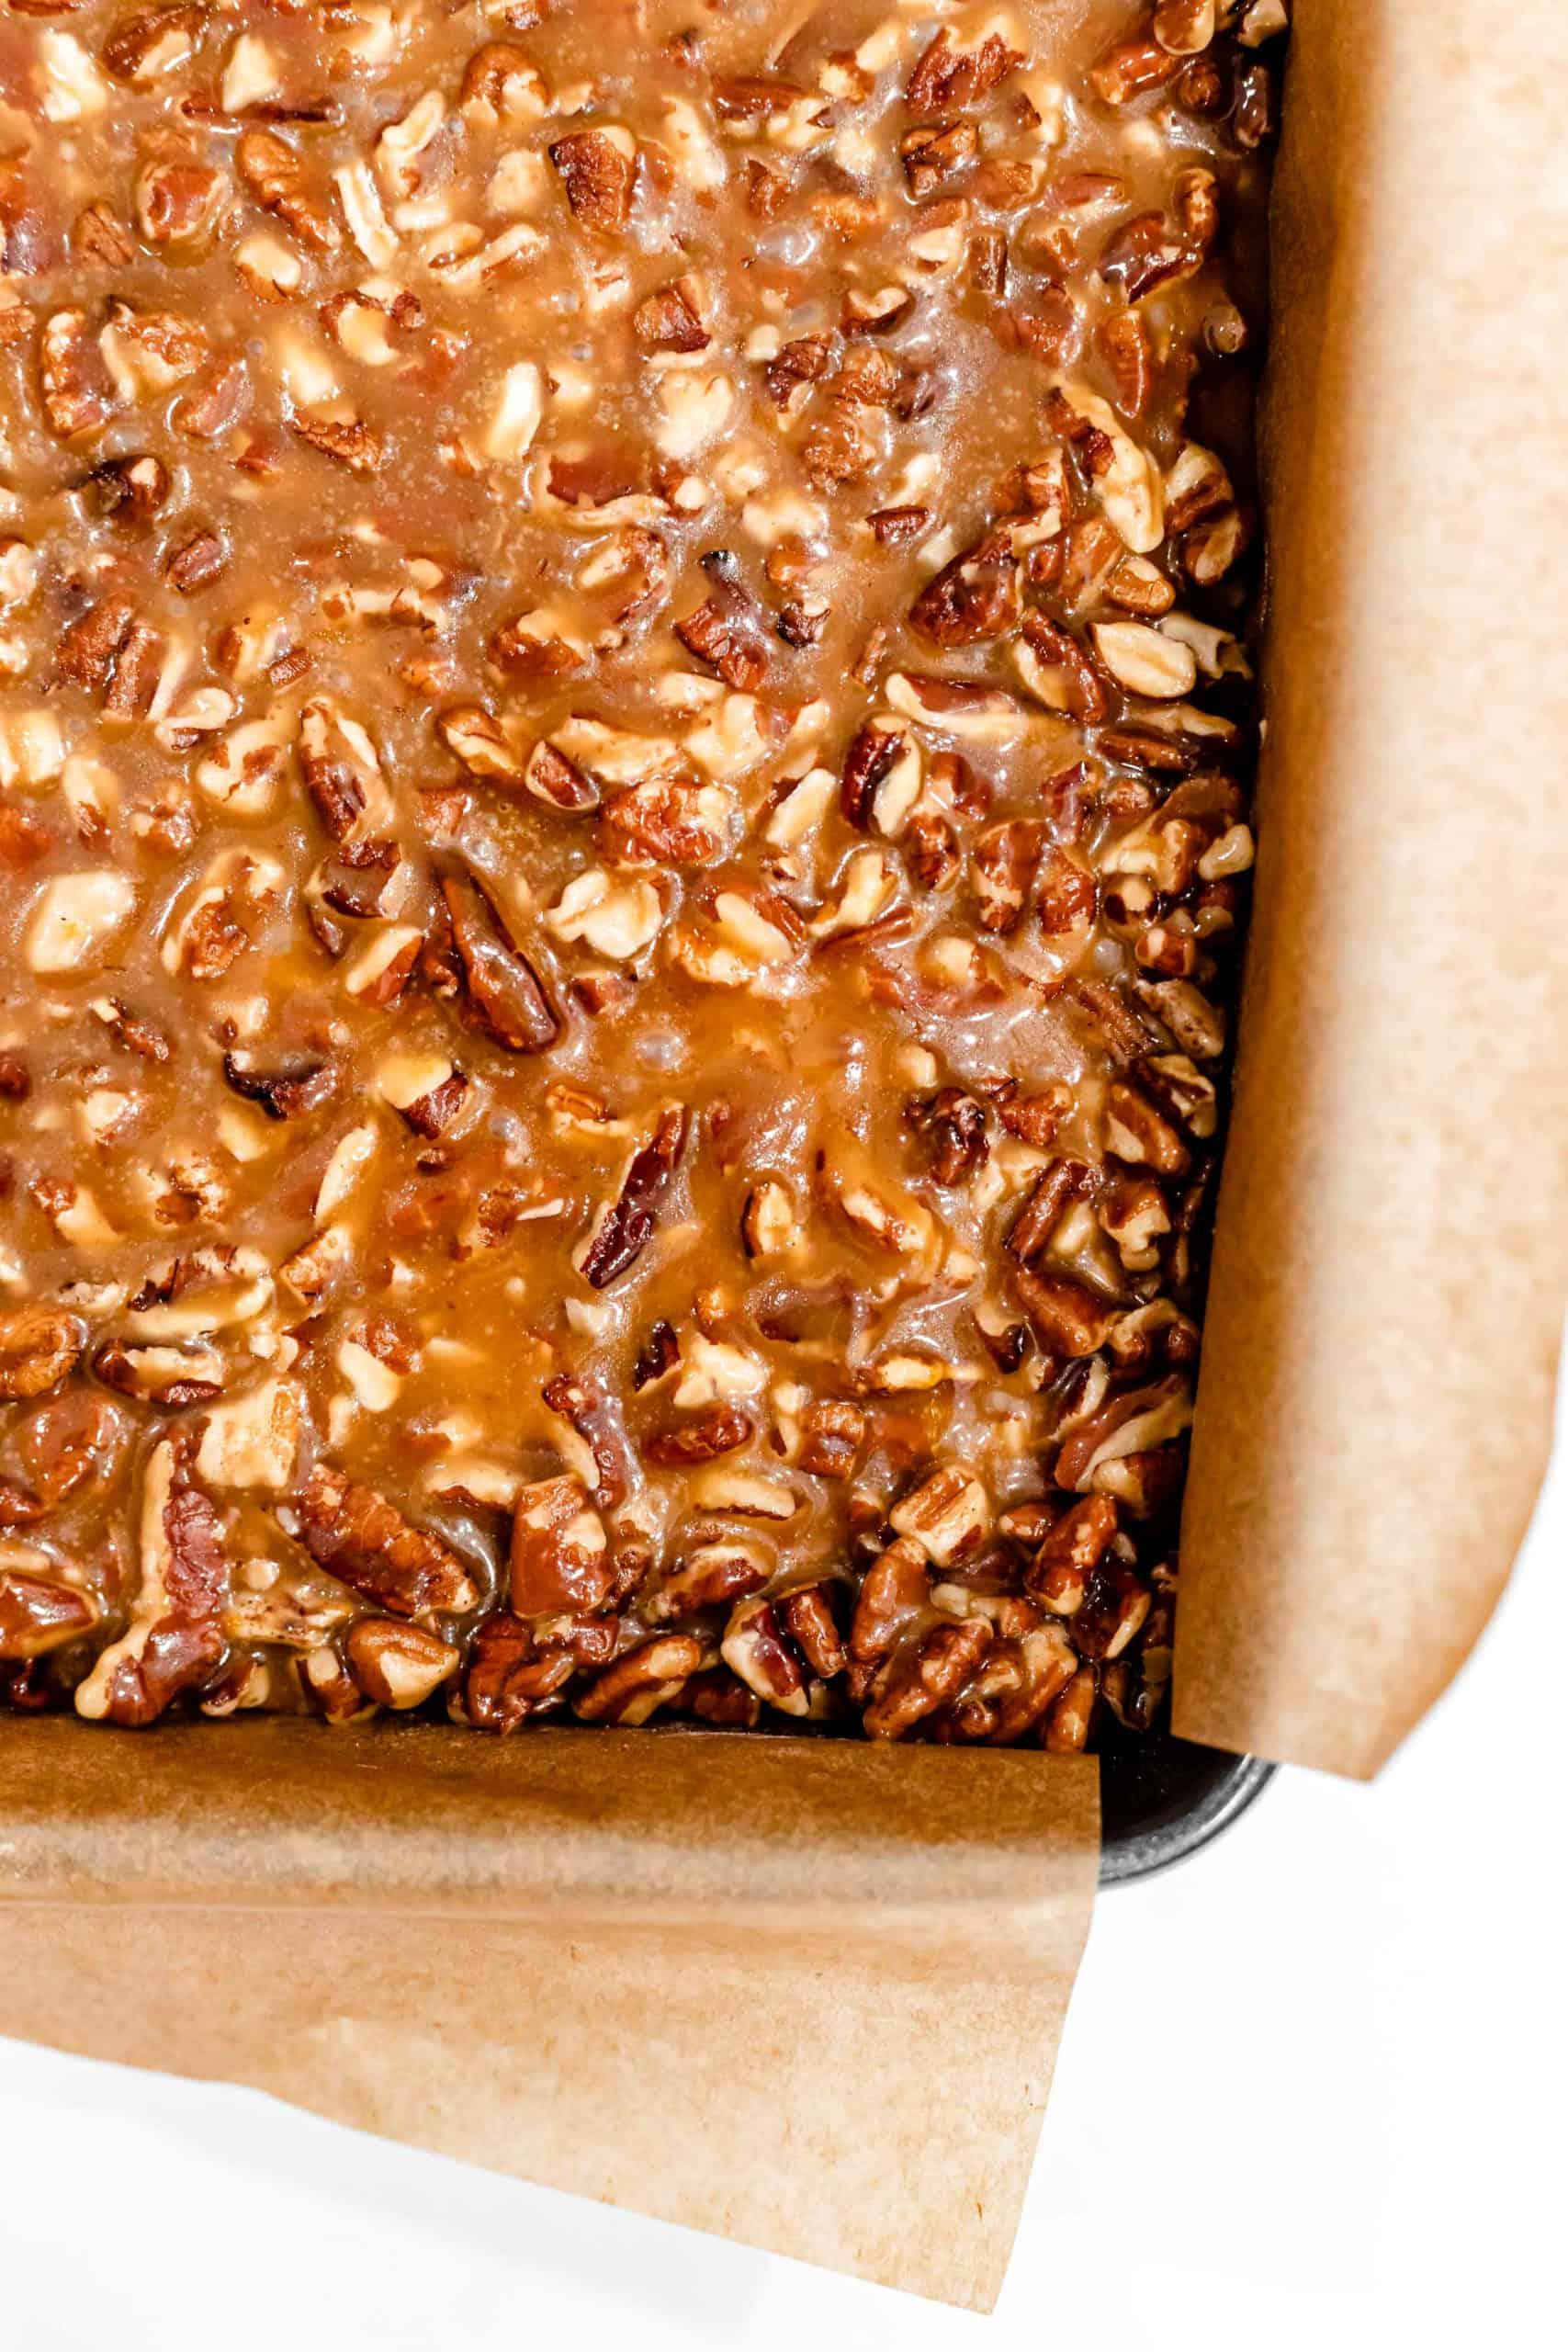 unbaked caramel pecan bars in pan